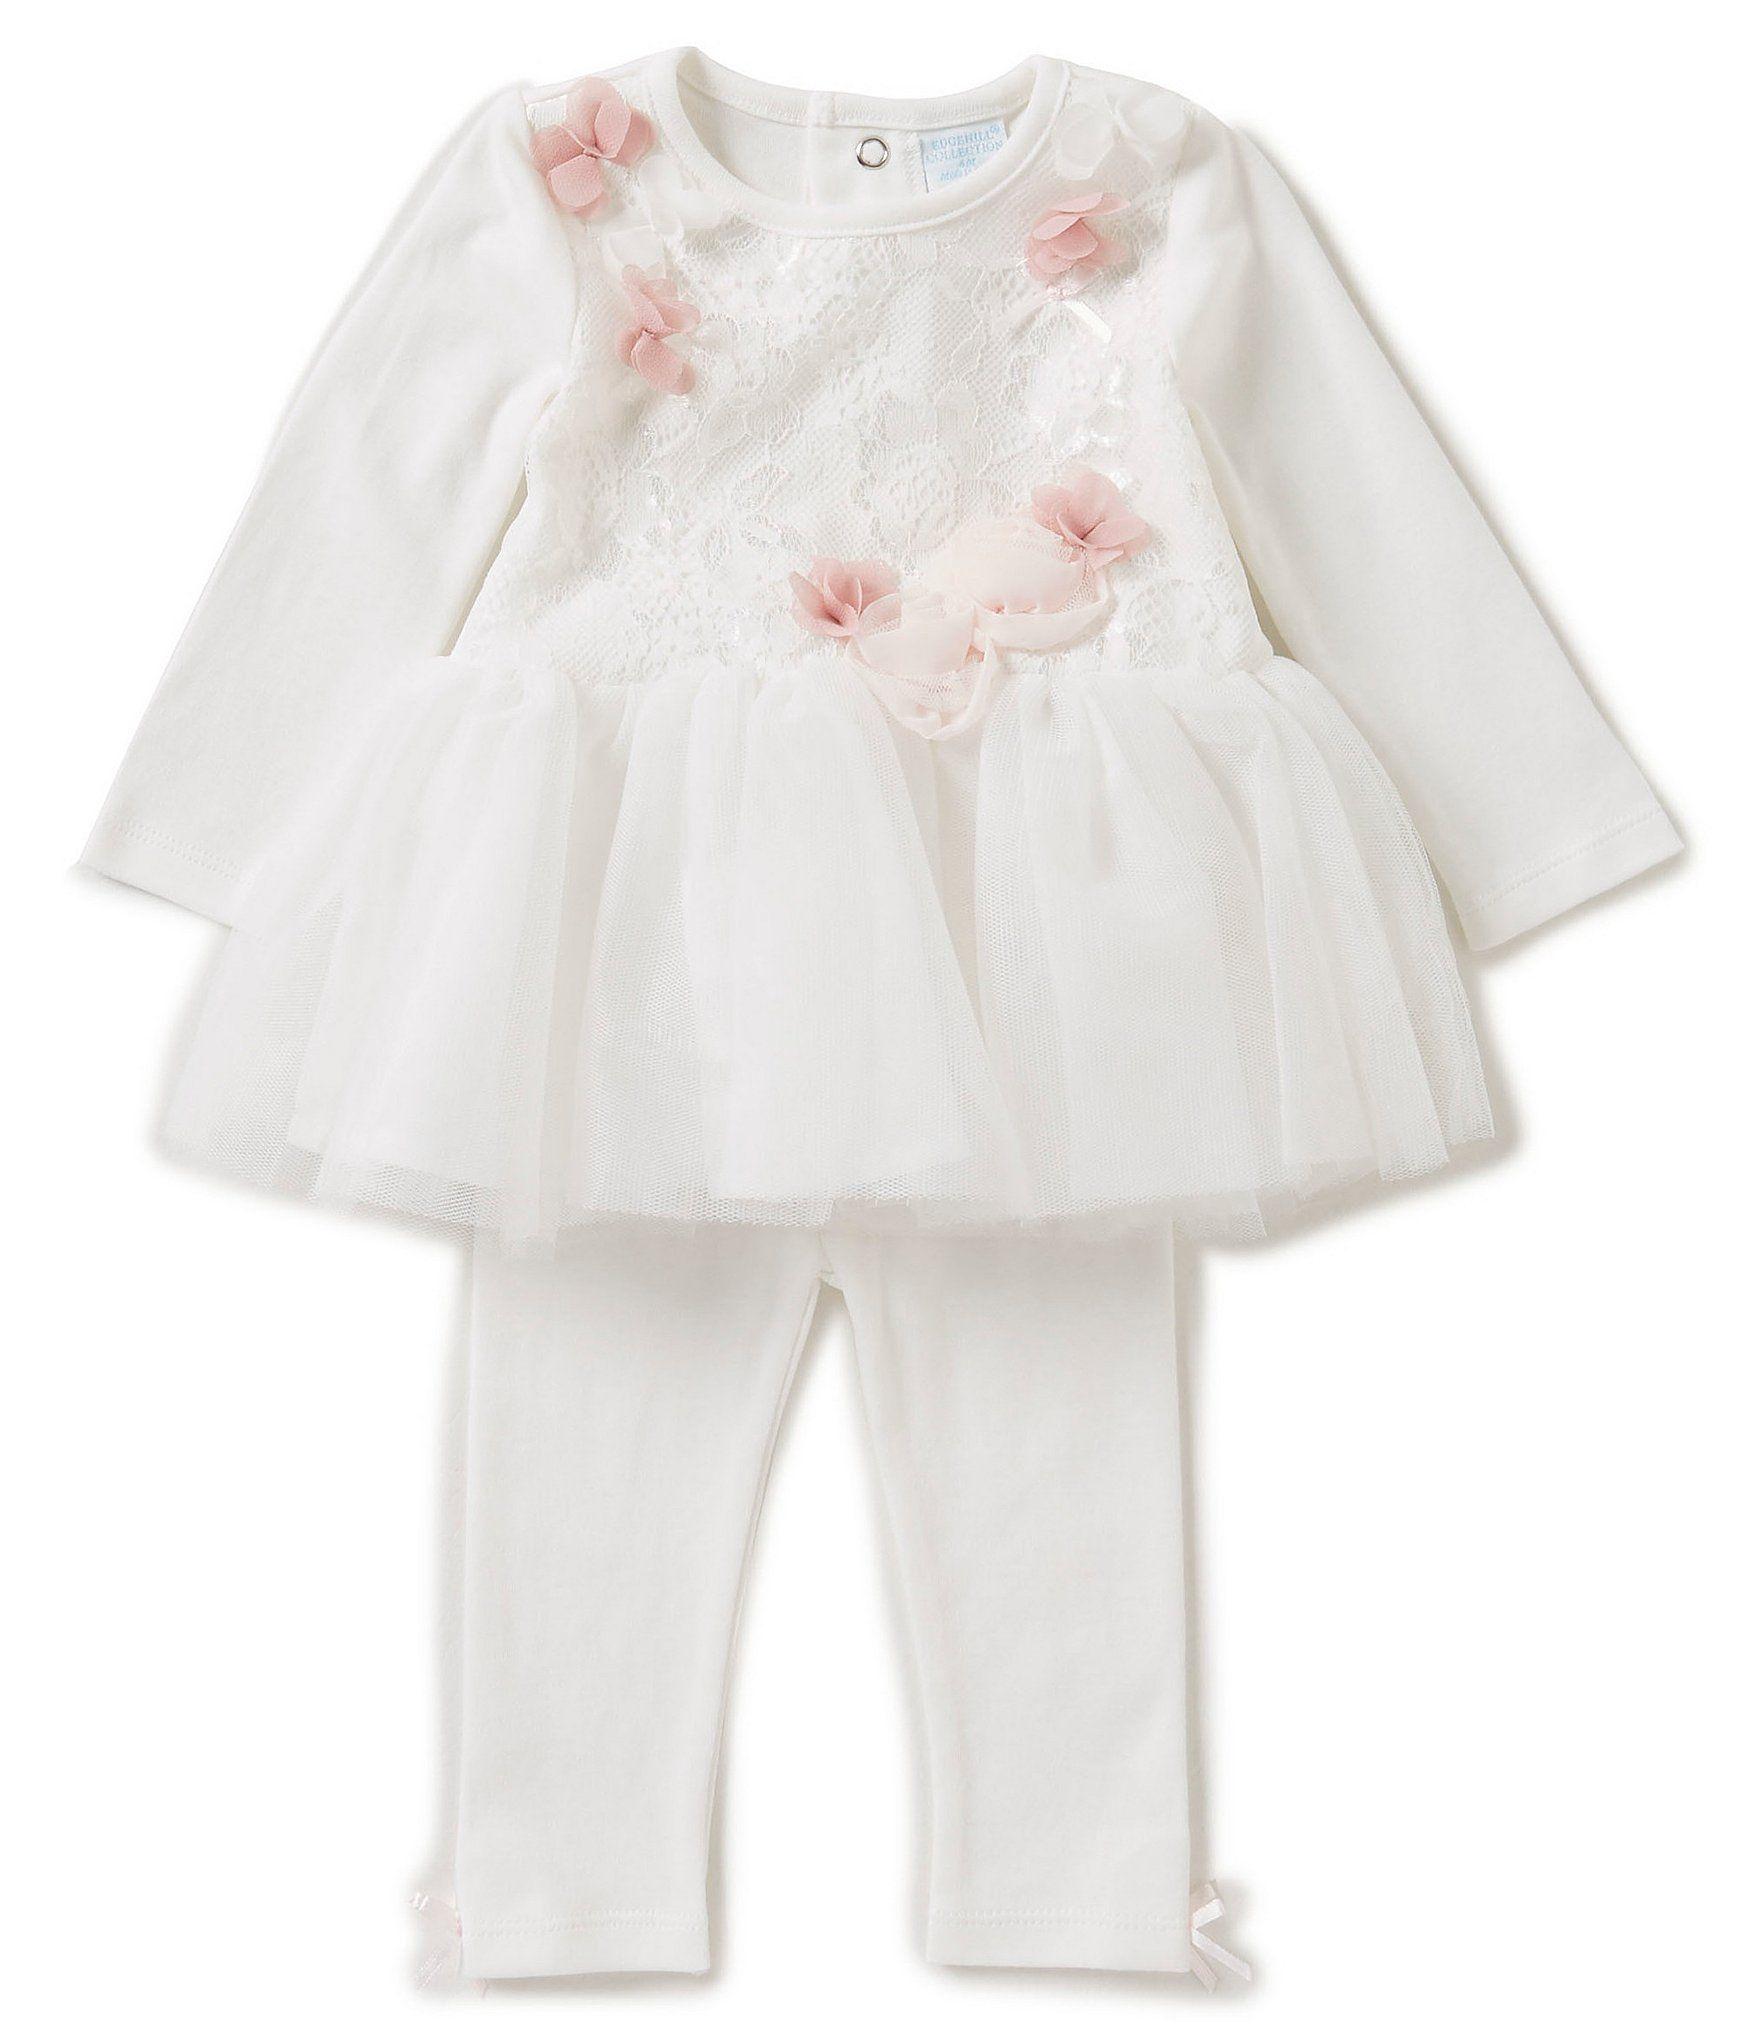 a5eae81a385b Edgehill Collection Baby Girls Newborn-6 Months Floral-Applique Tutu ...